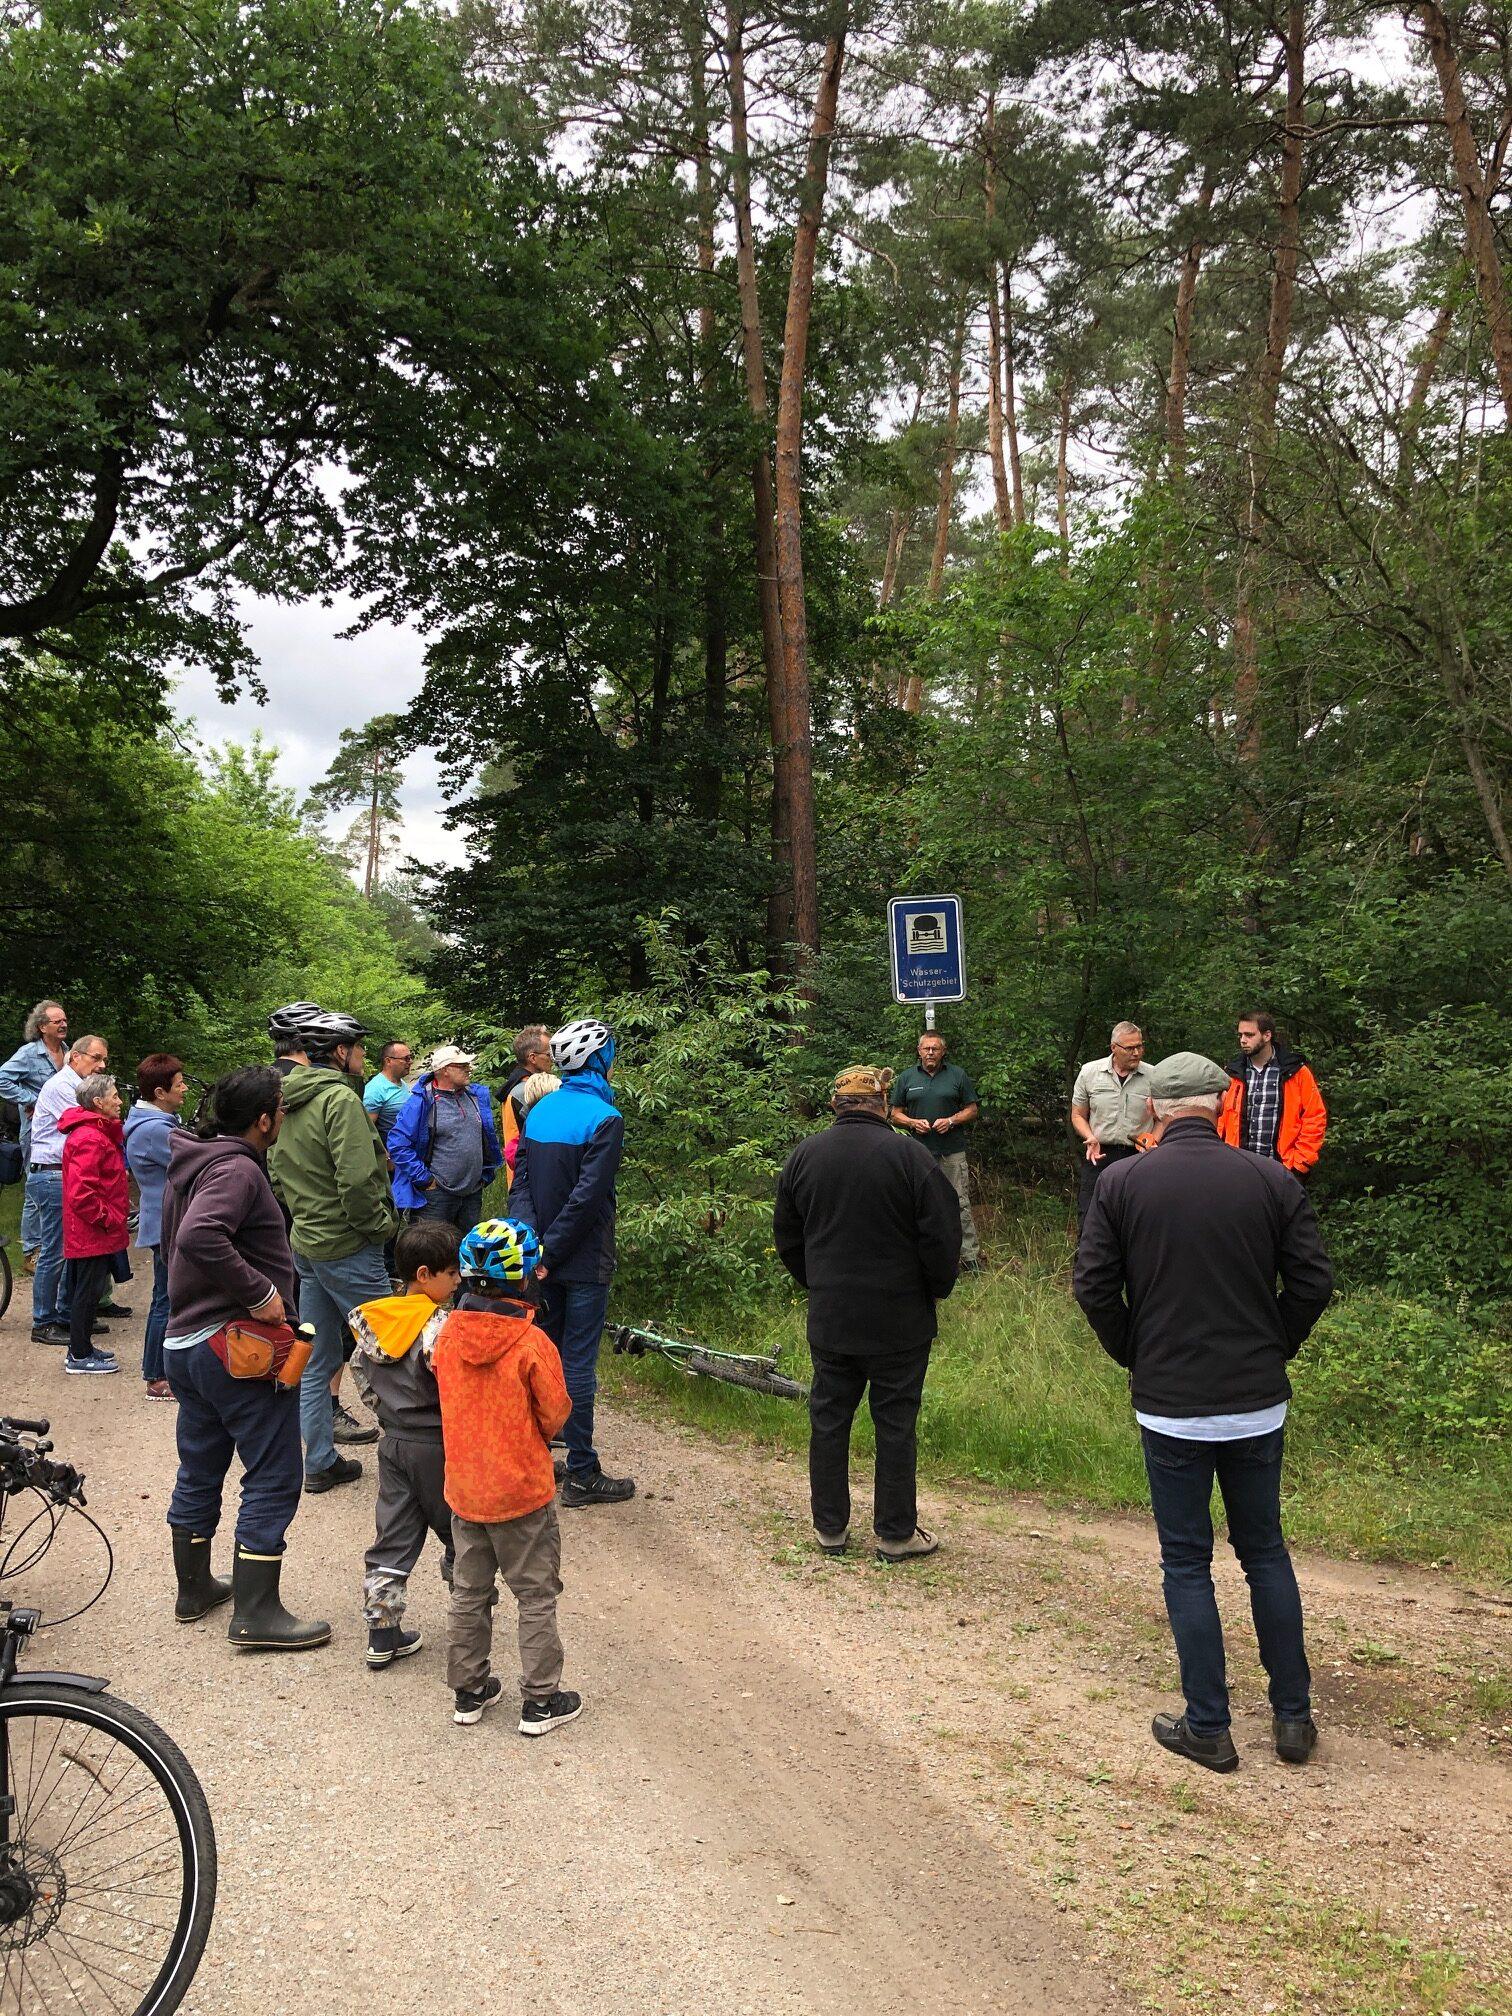 Waldbegehung mit dem Fahrrad